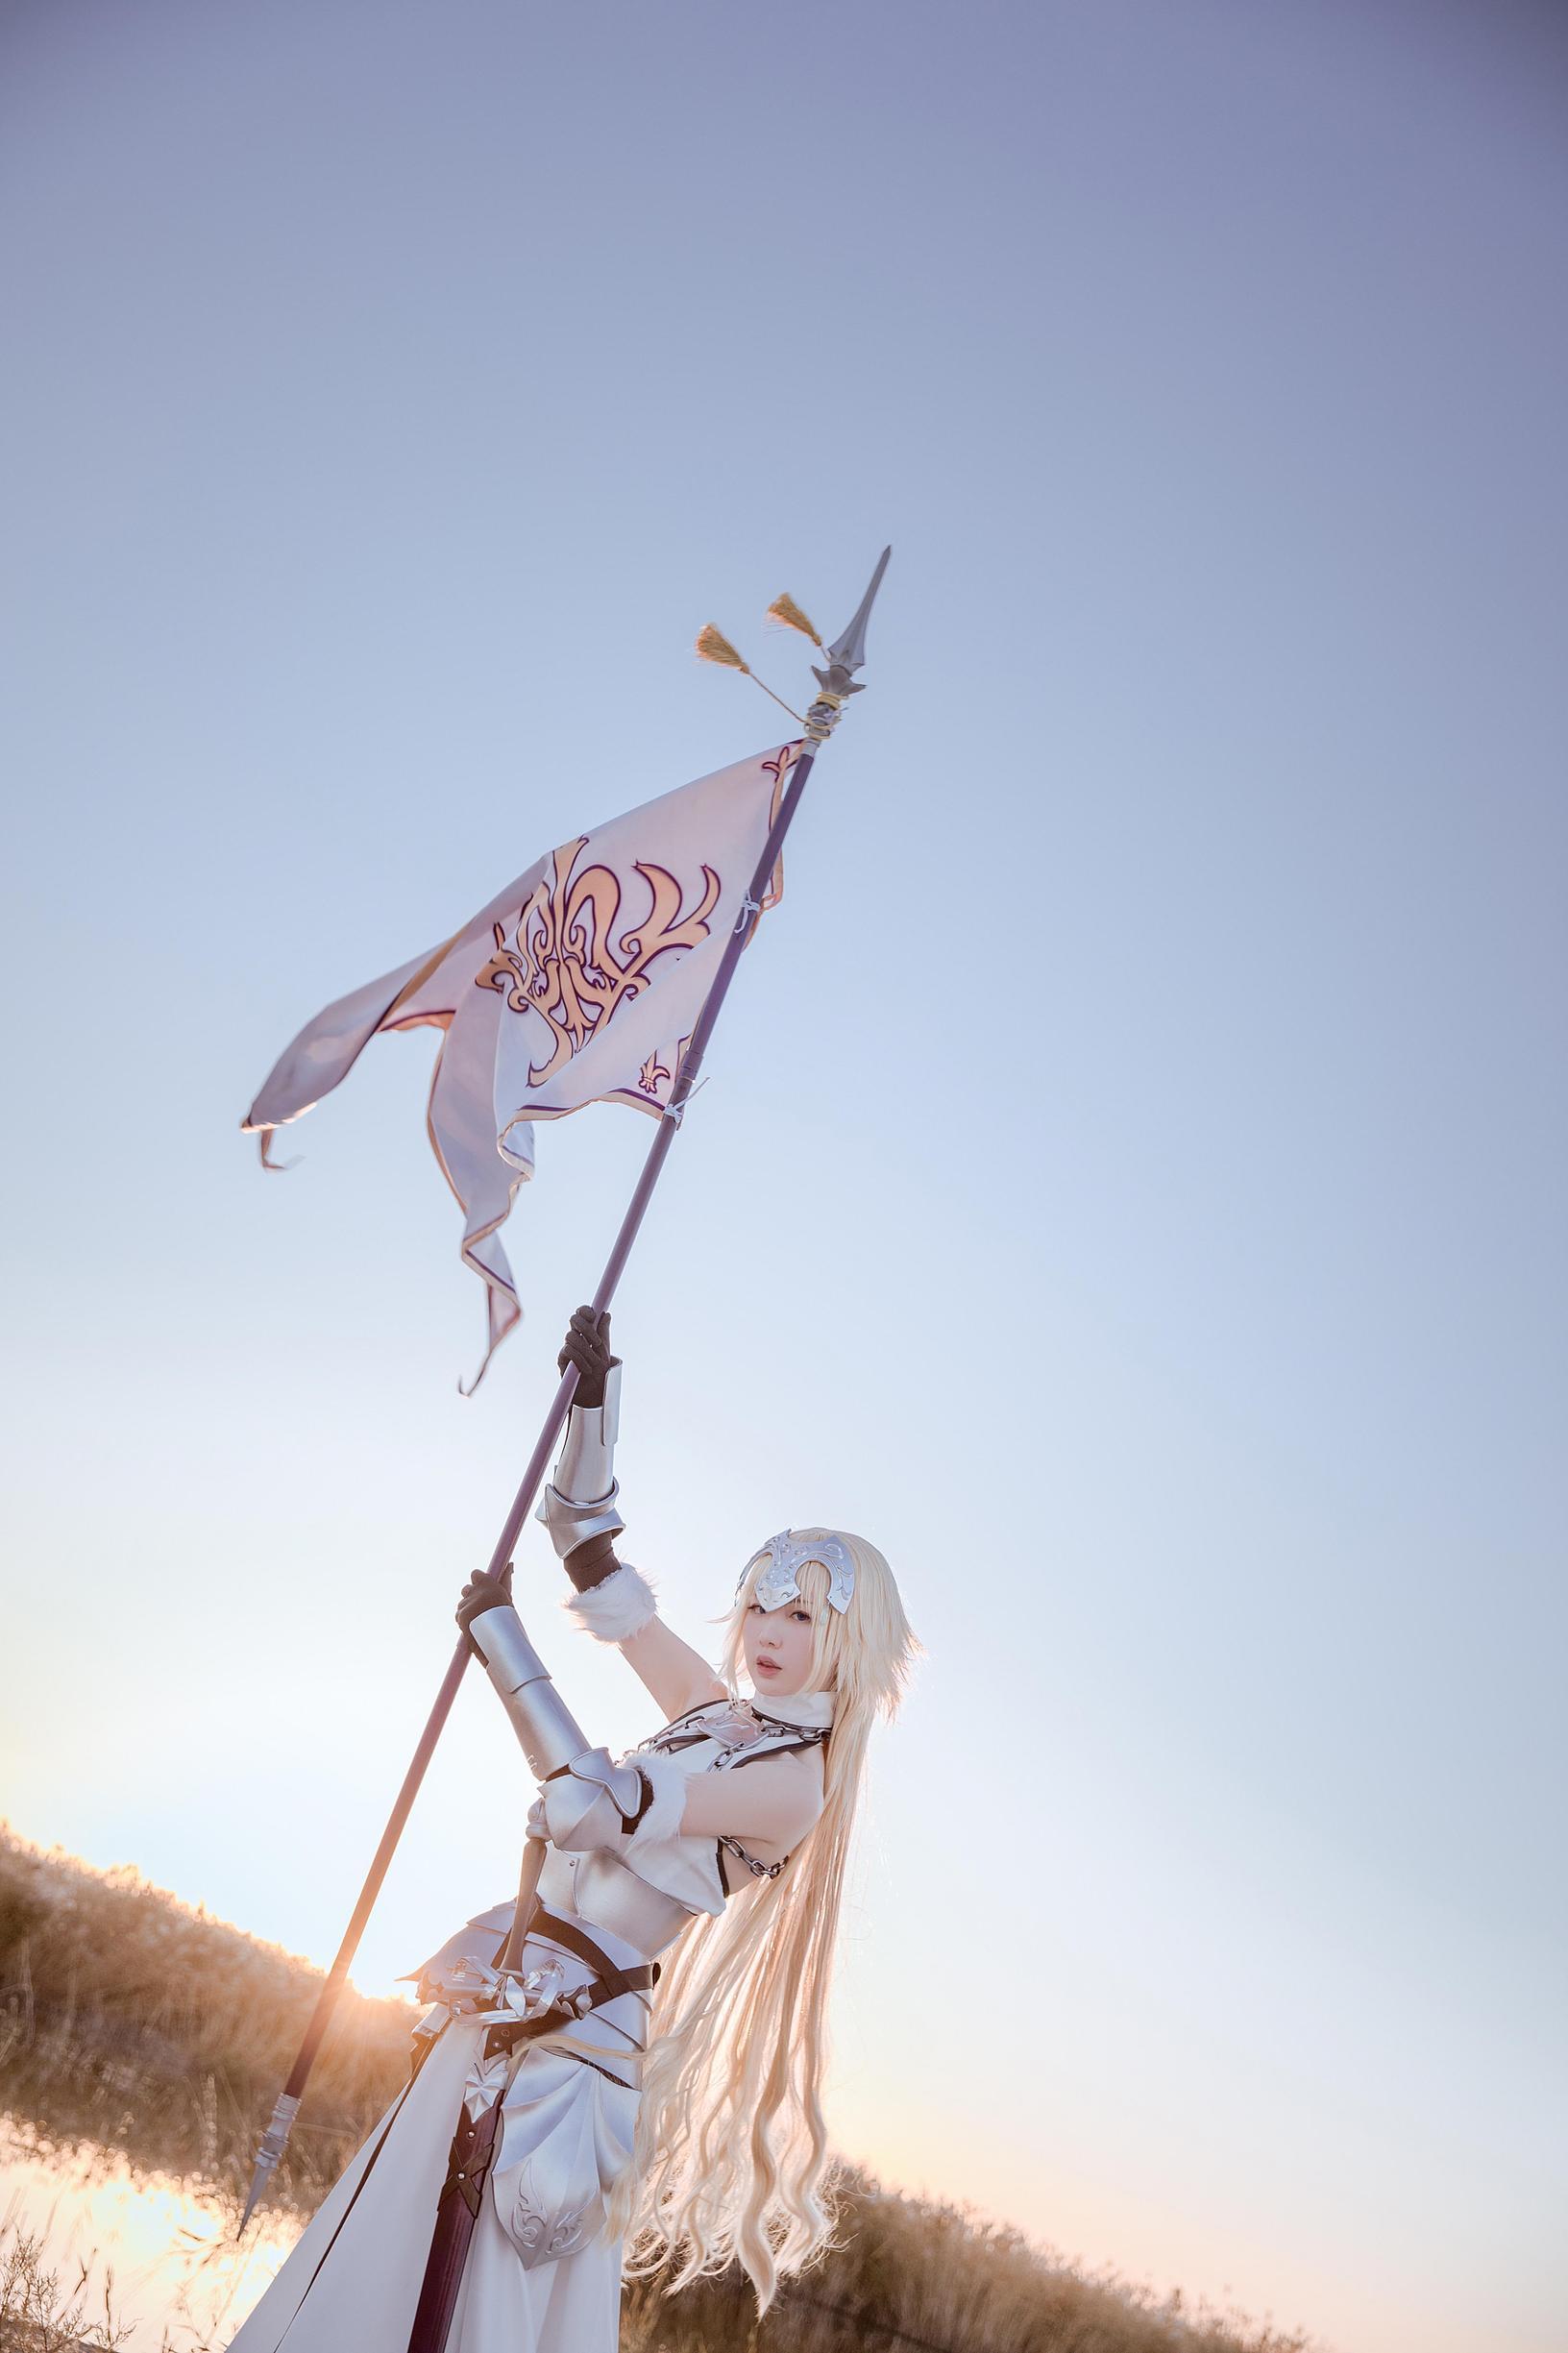 《FATE/GRAND ORDER》贞德cosplay【CN:茶茶子cya】-第2张